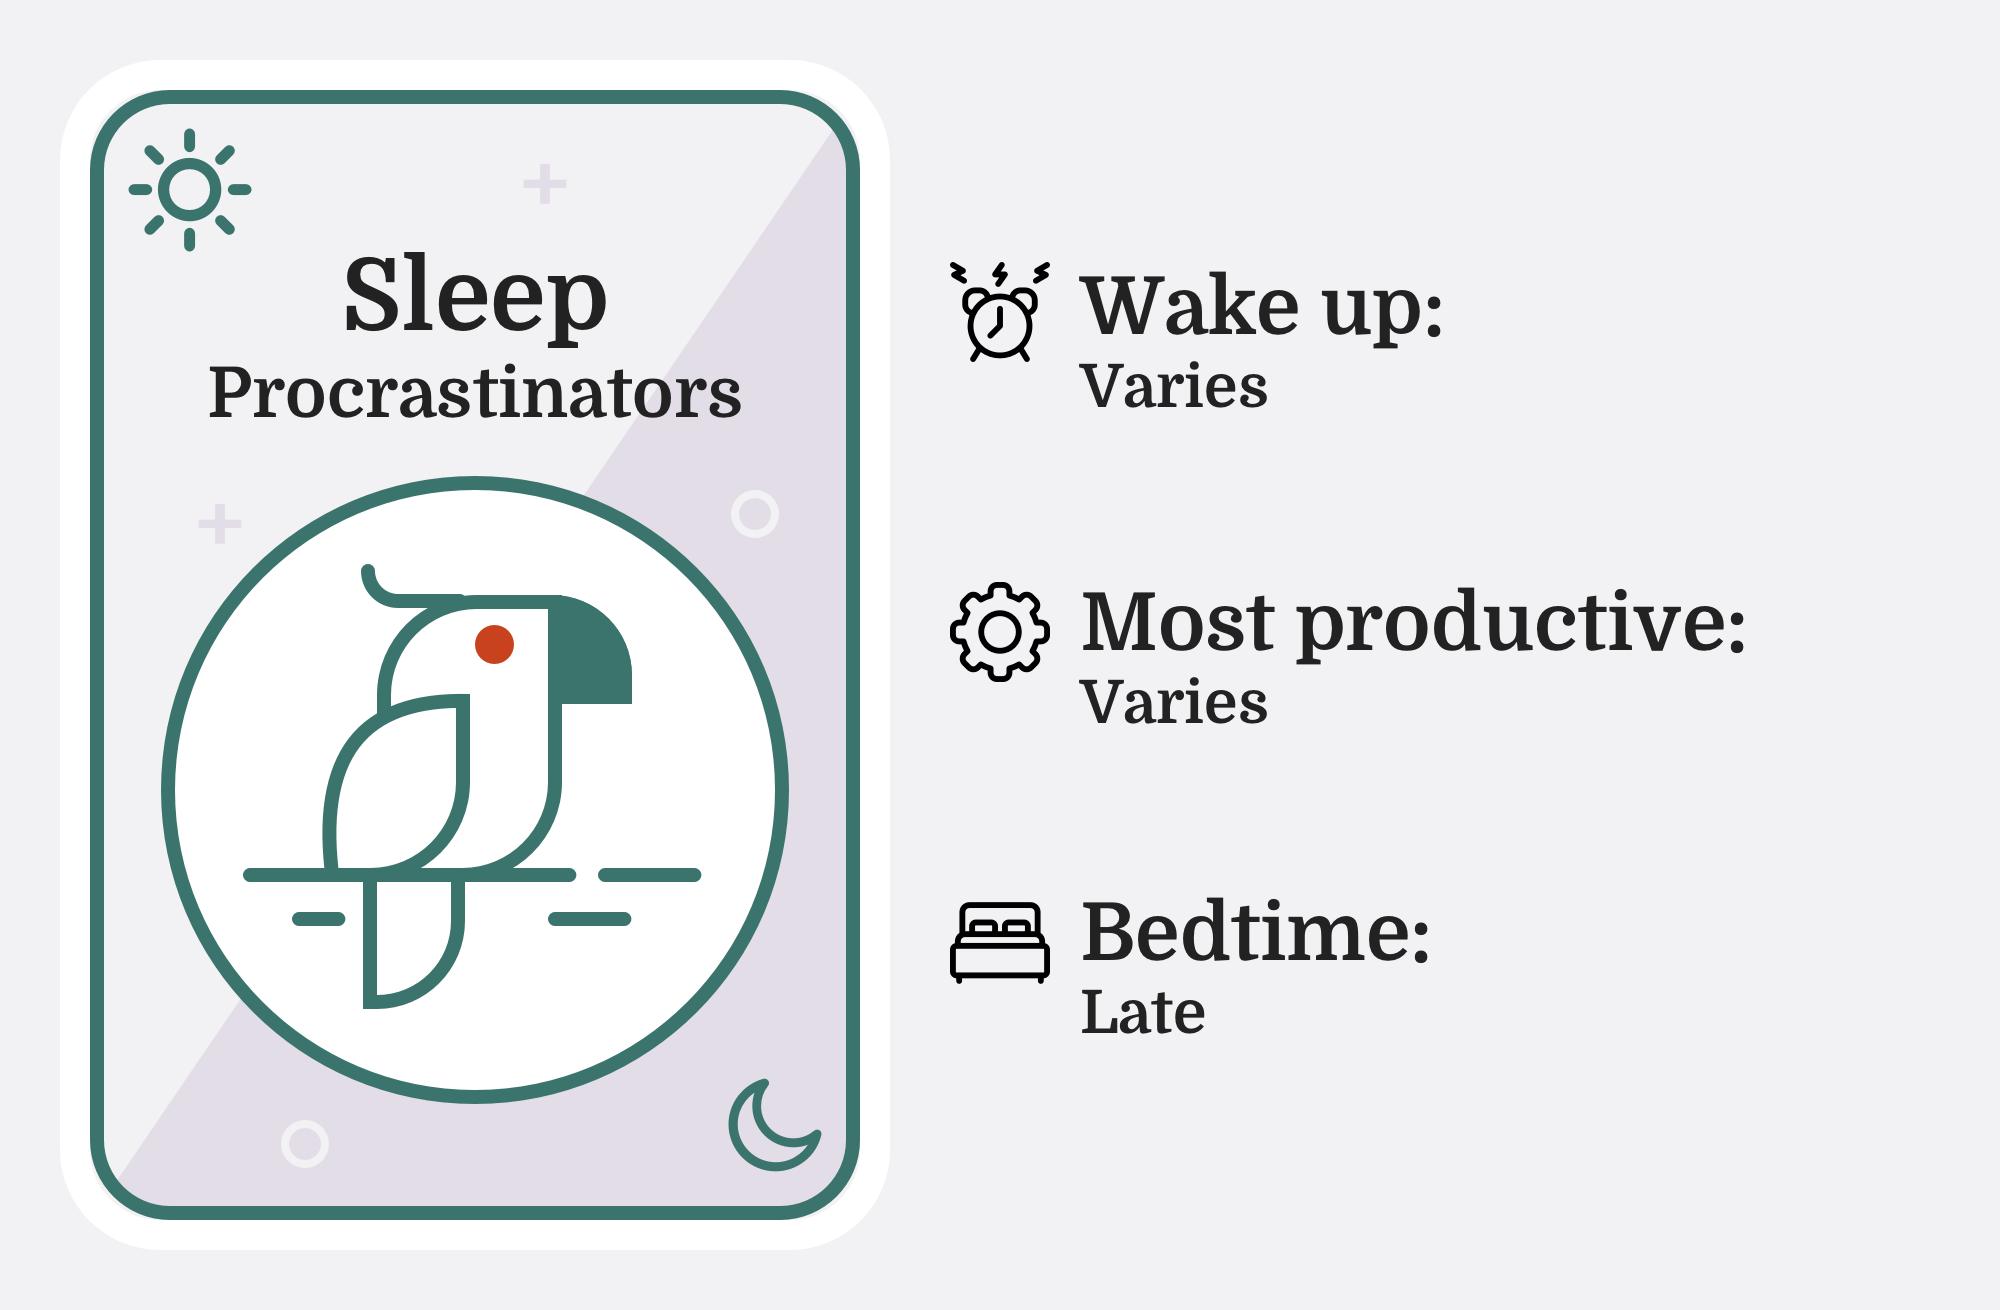 Image of a parrot with the caption 'Sleep Procrastinators'